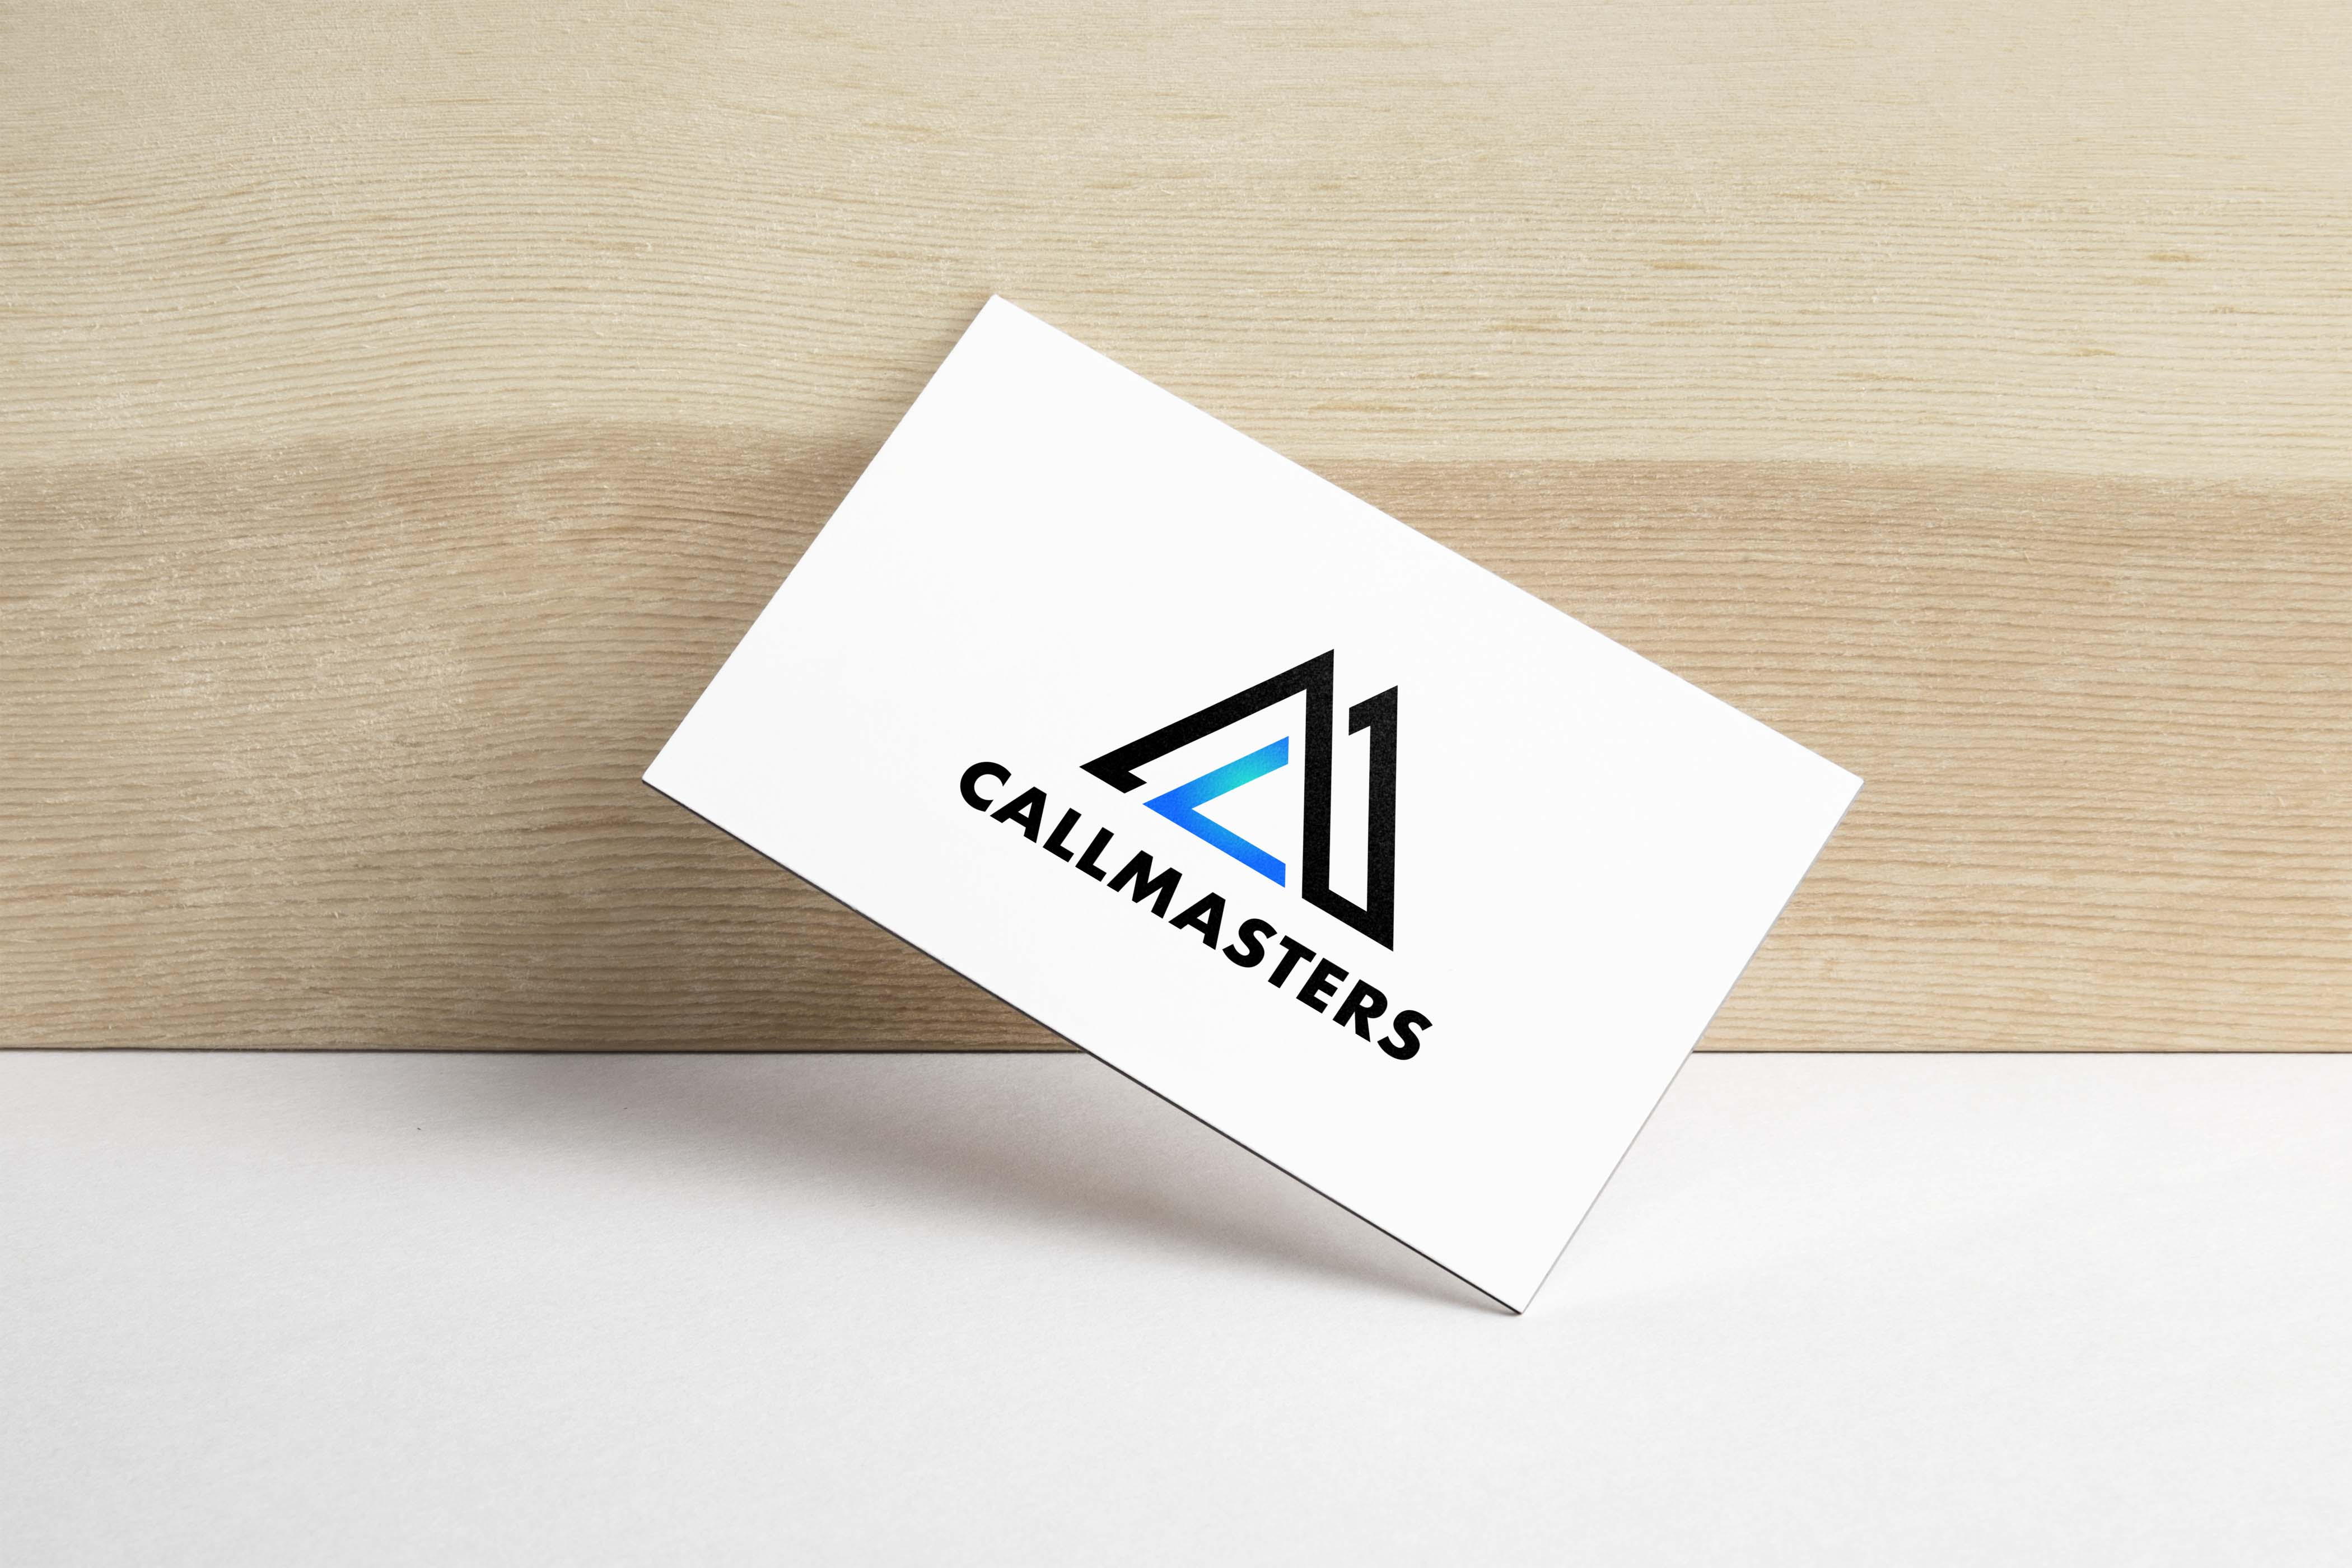 Логотип call-центра Callmasters  фото f_3905b6c9a86ef9b4.jpg